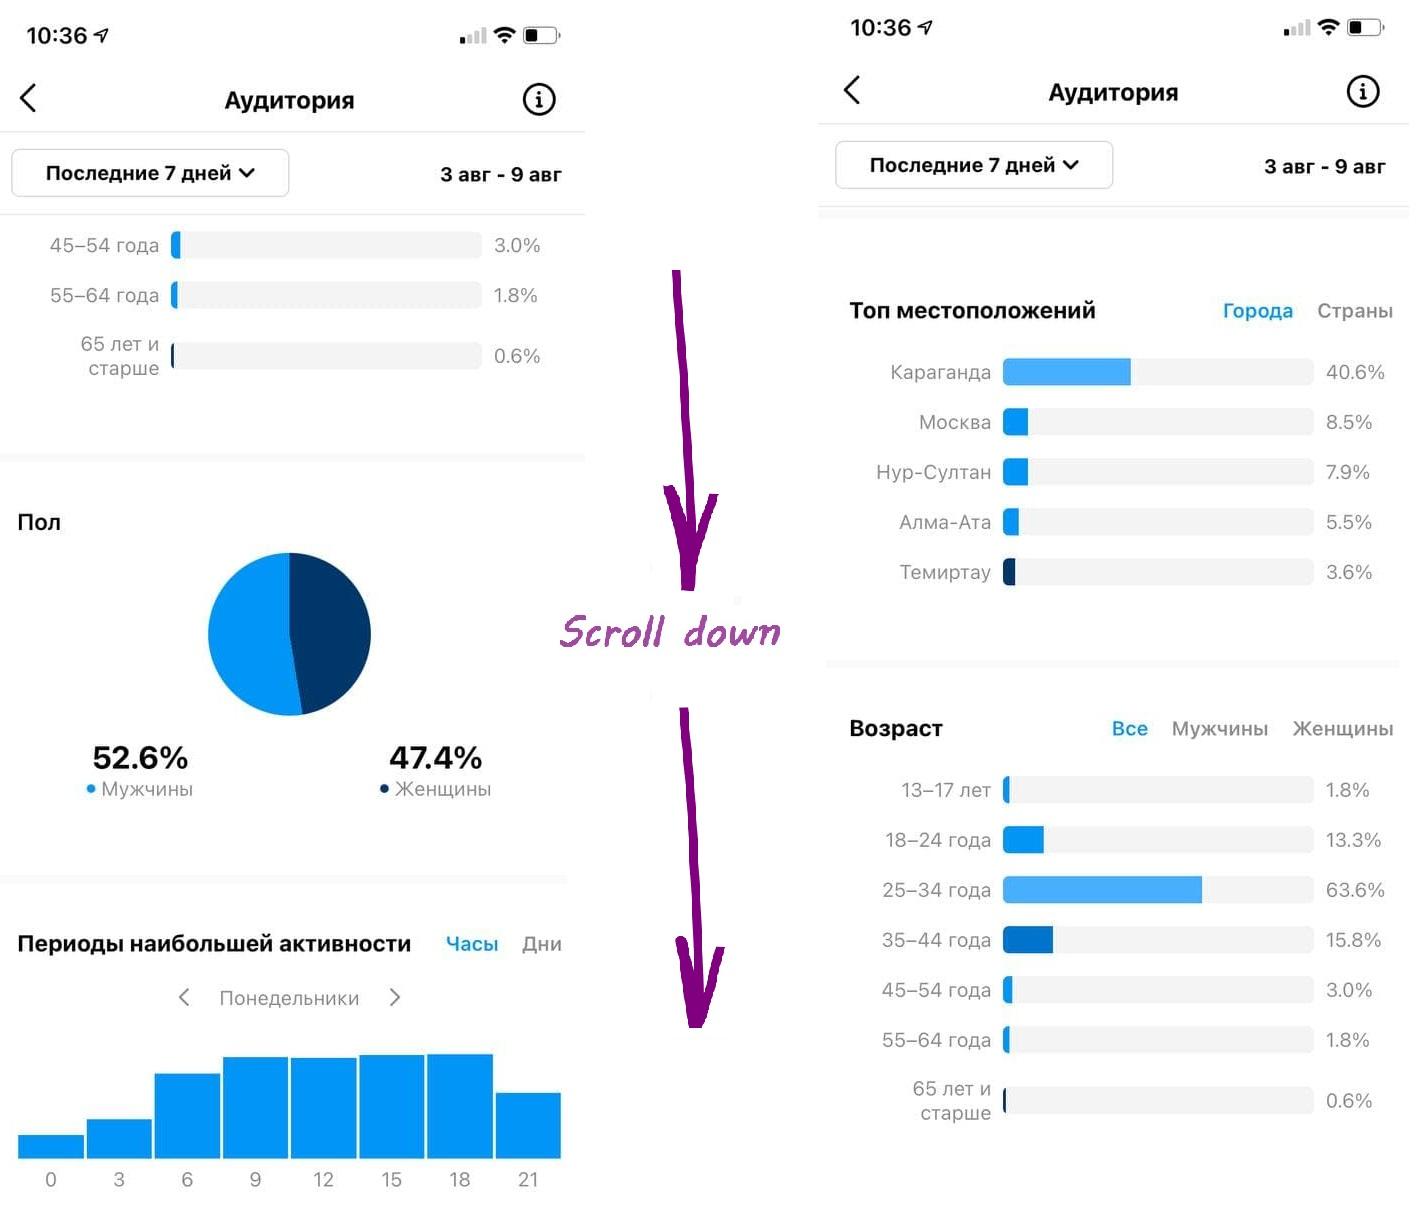 Статистика аудитории в Инстаграме